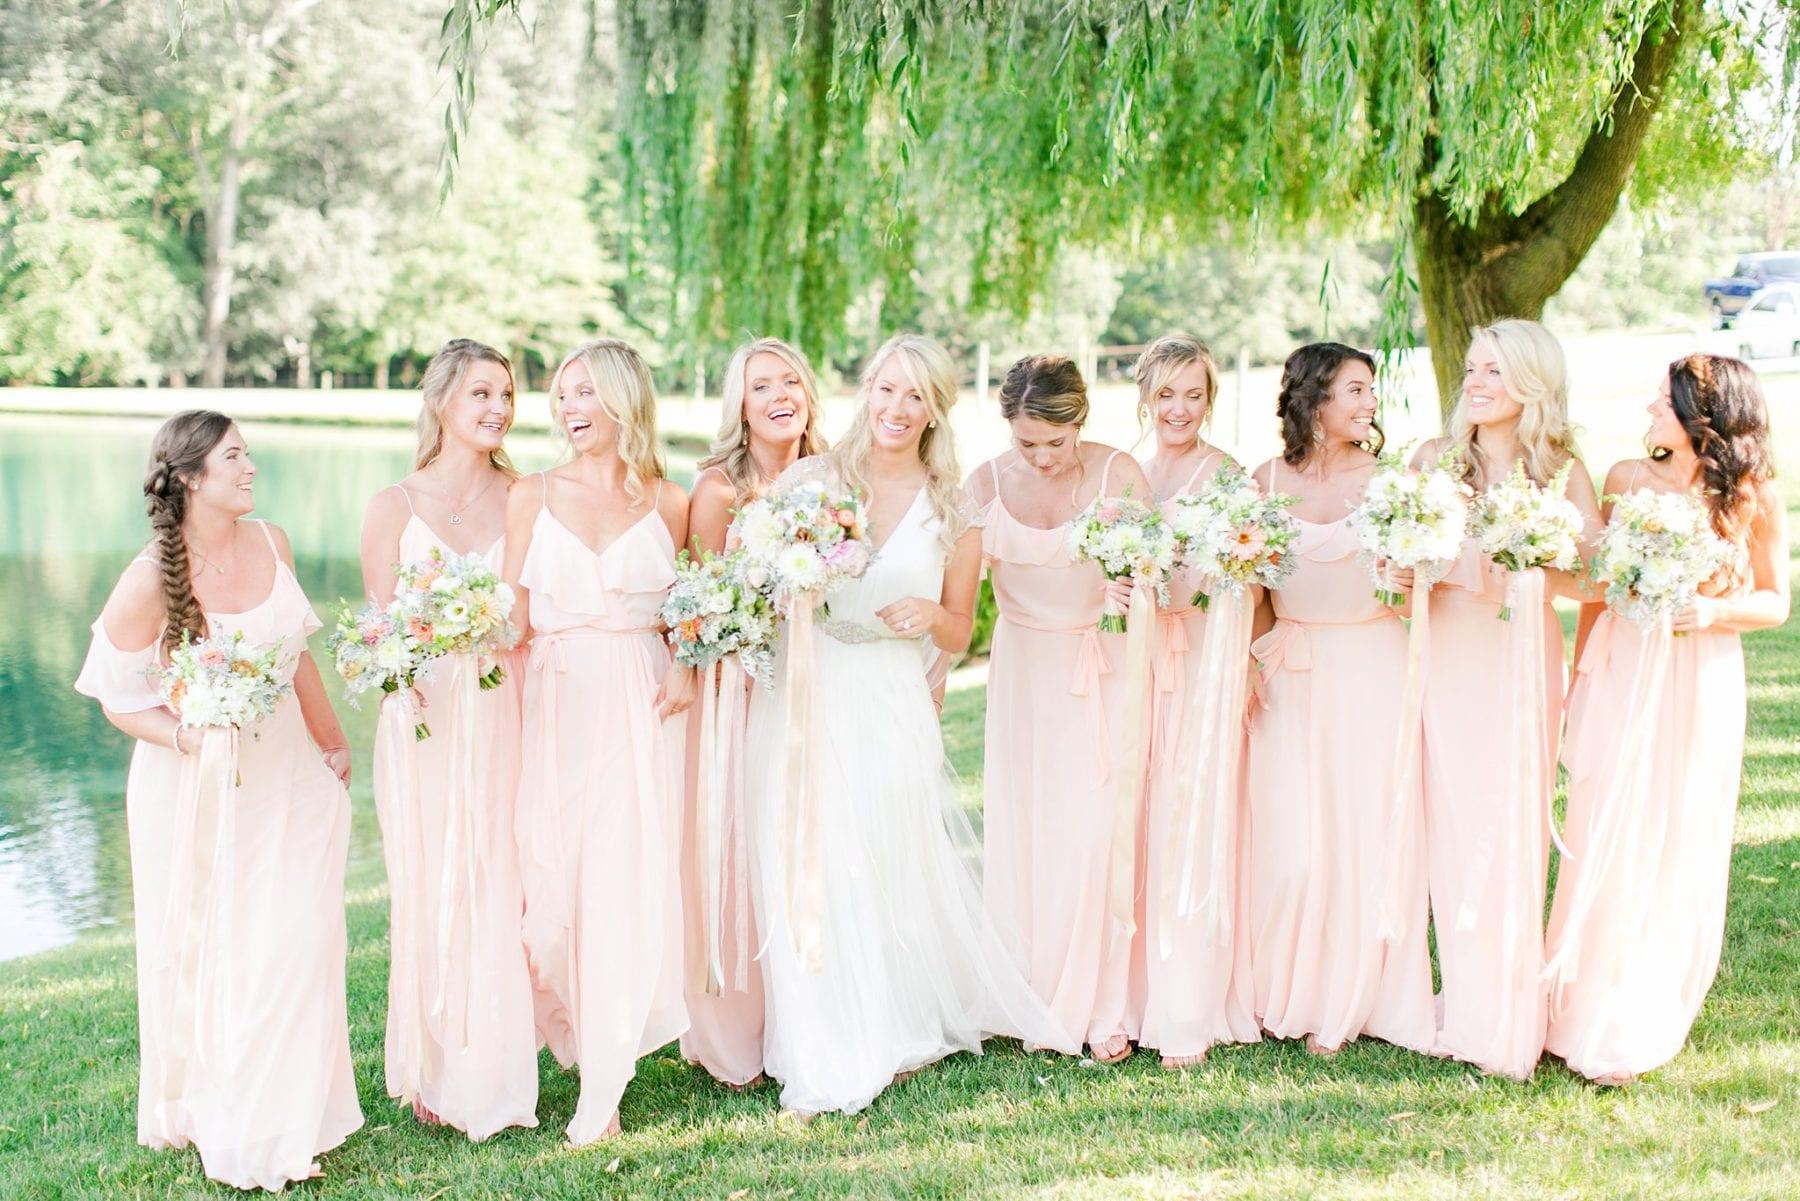 Pond View Farm Wedding Photos Maryland Wedding Photographer Kristen & Ryan Megan Kelsey Photography Blog-151.jpg